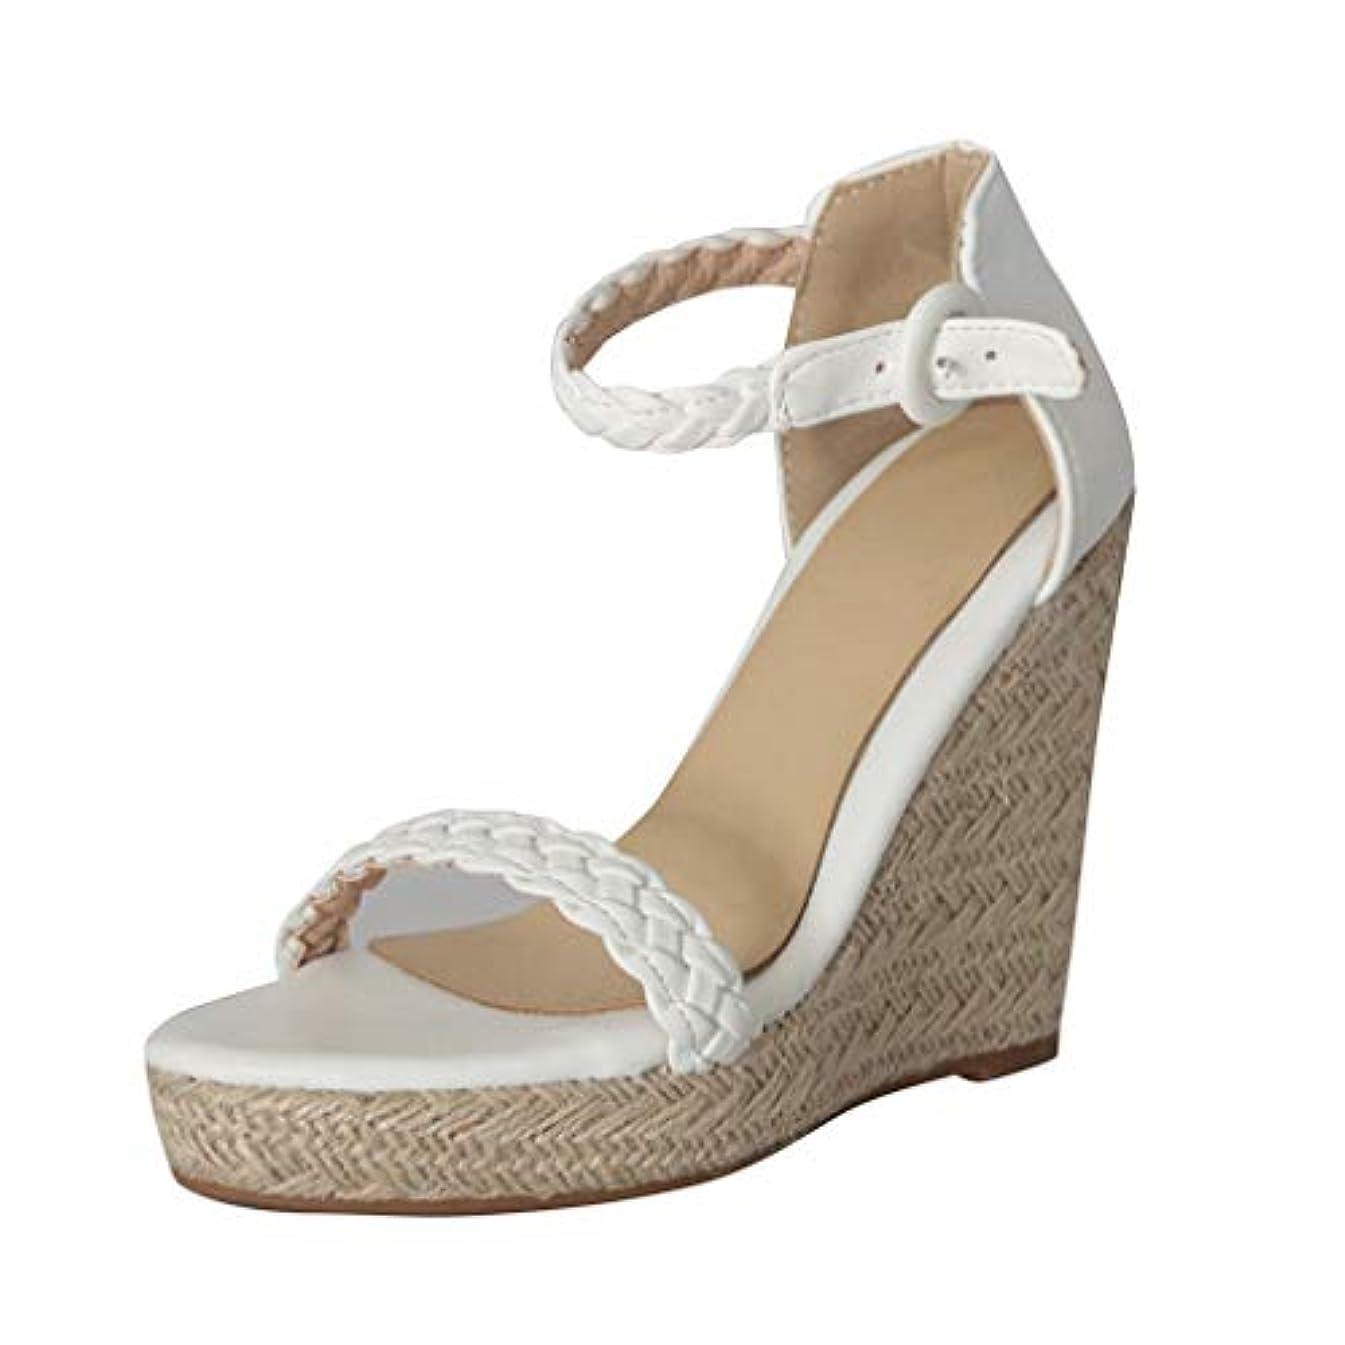 2019 New Womens Retro Open Toe Ankle Espadrilles Wedge Flats Shoe Buckle-Strap Roman Sandals White, Gold Size: 35-43